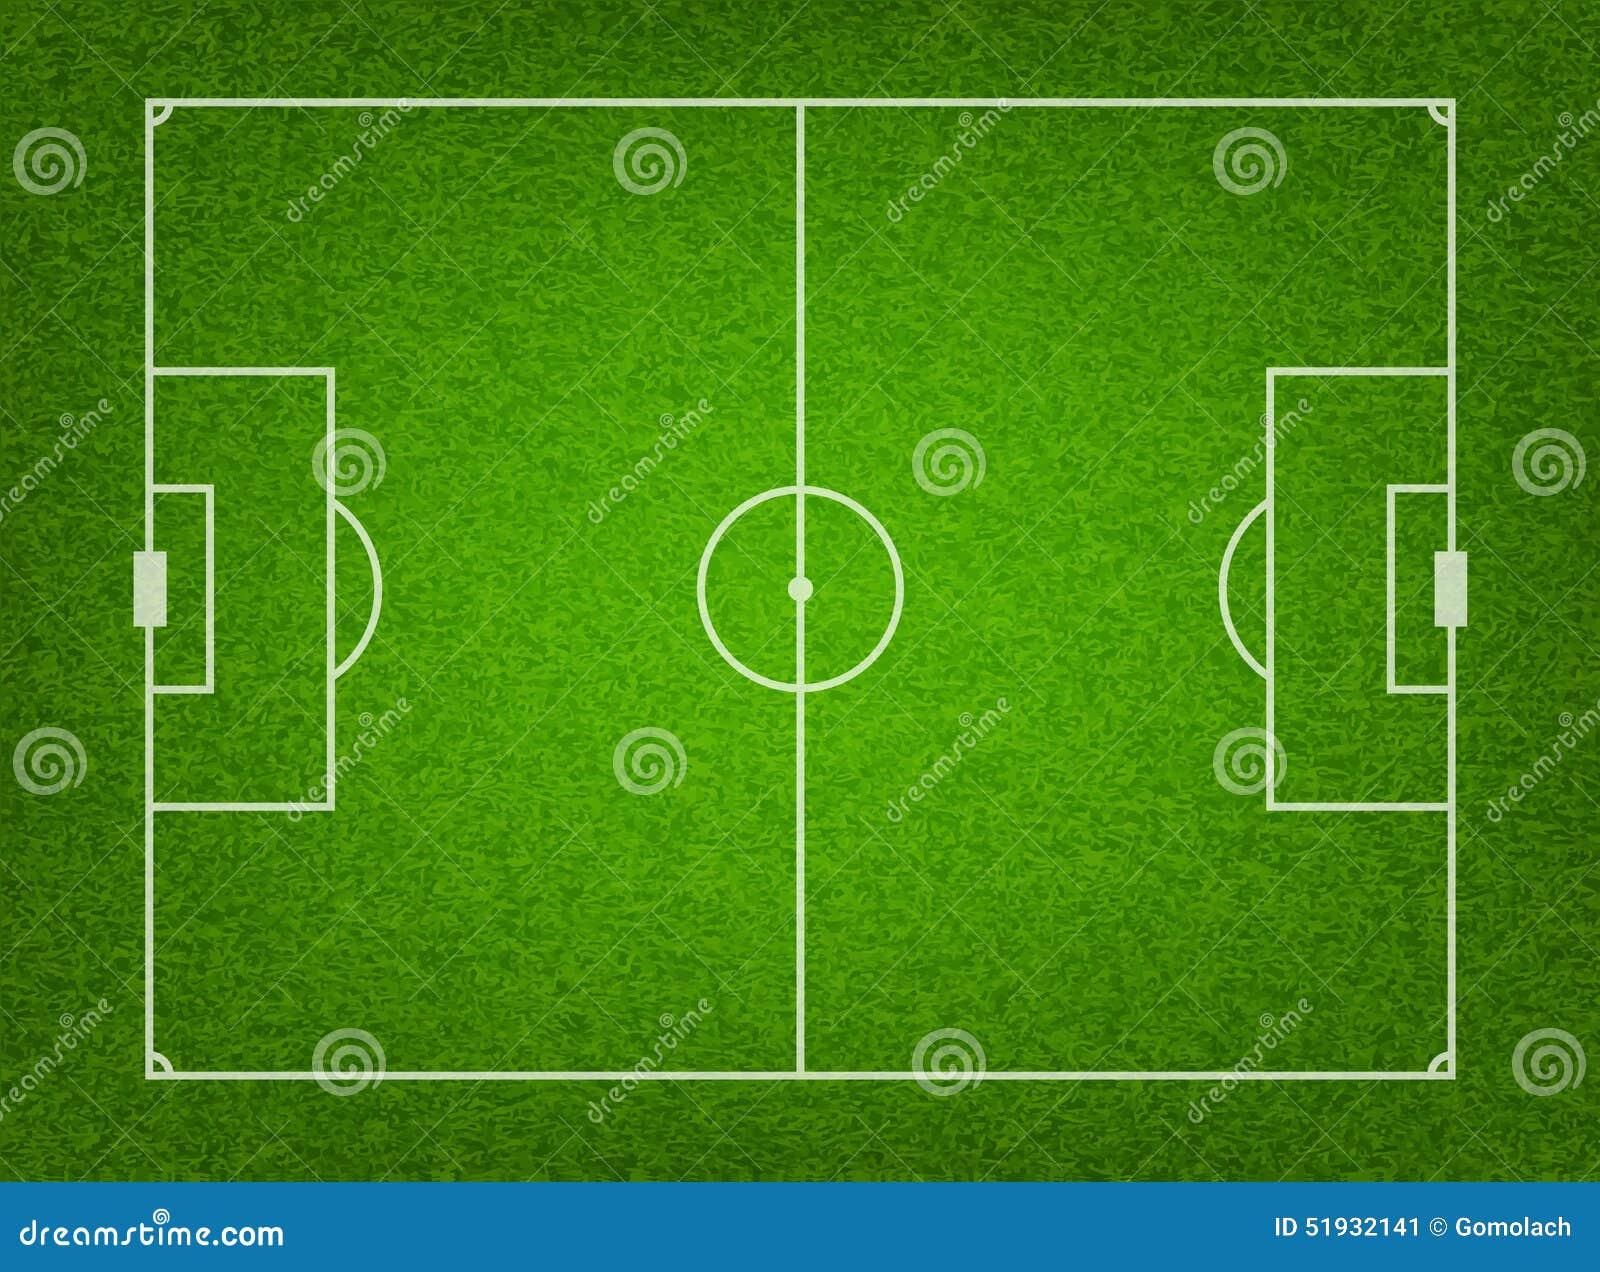 terrain de football texturis d 39 herbe illustration de vecteur illustration du football. Black Bedroom Furniture Sets. Home Design Ideas